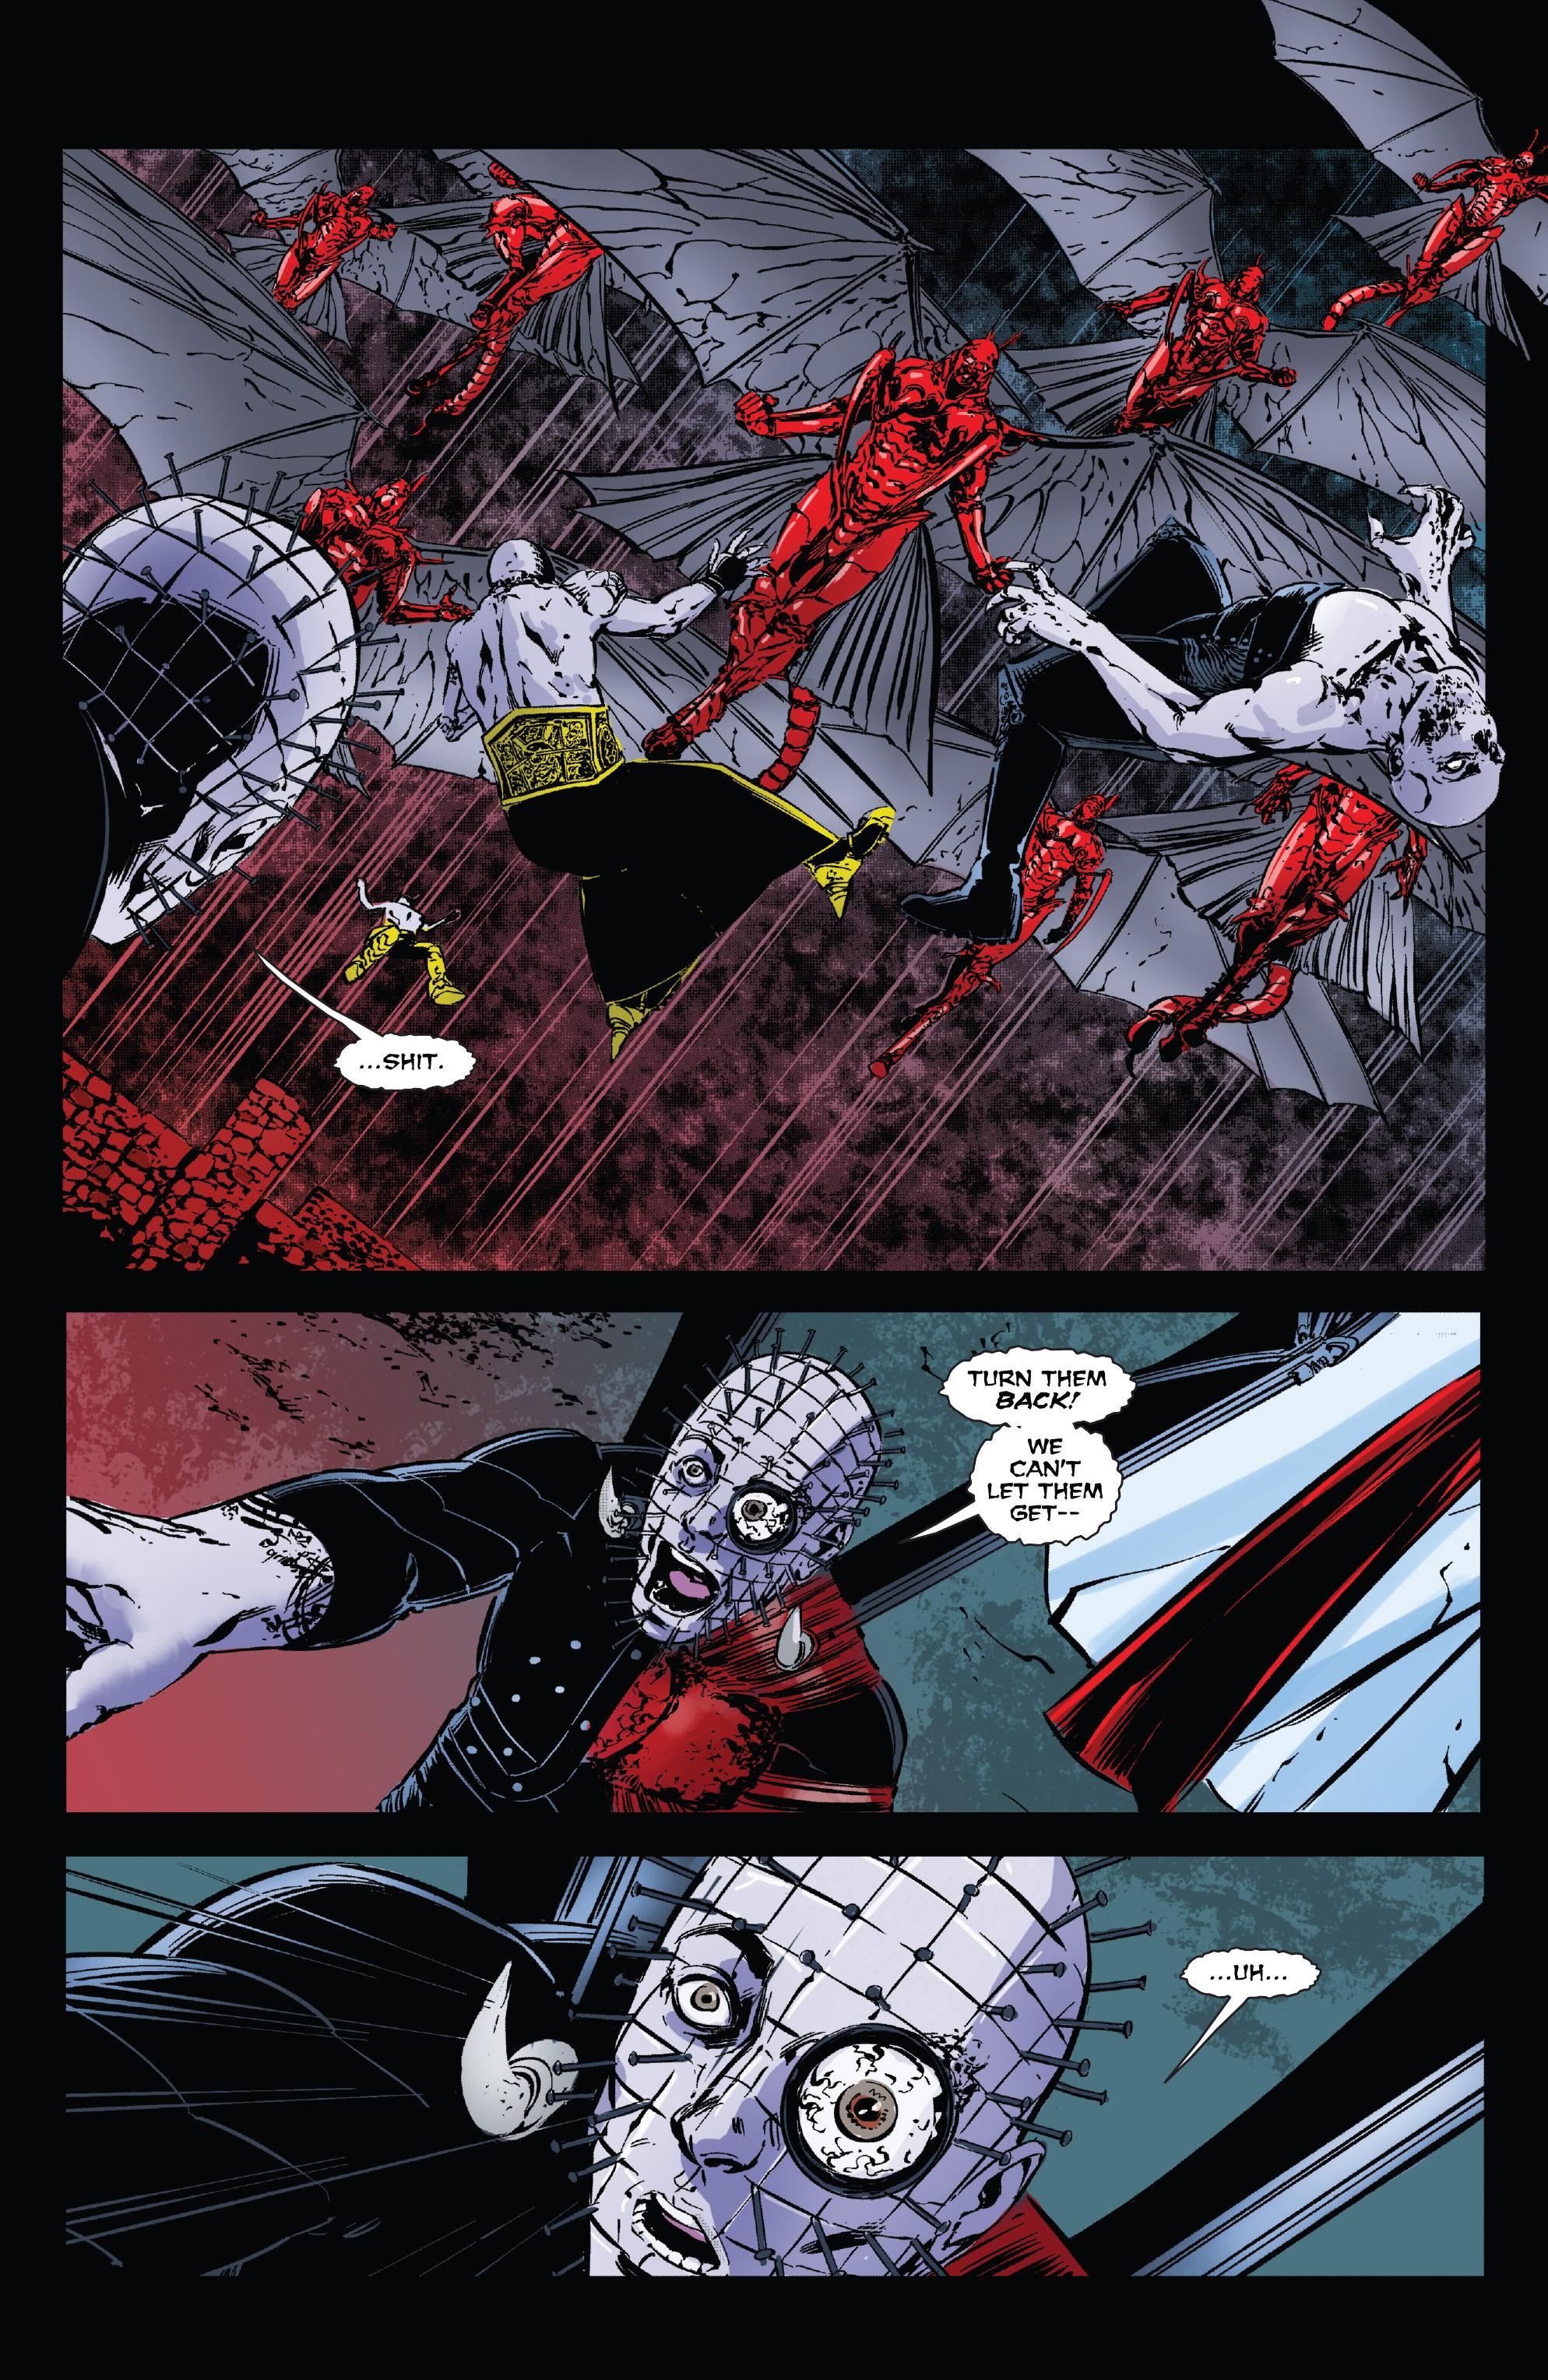 Read online Clive Barker's Hellraiser: The Dark Watch comic -  Issue # TPB 3 - 79